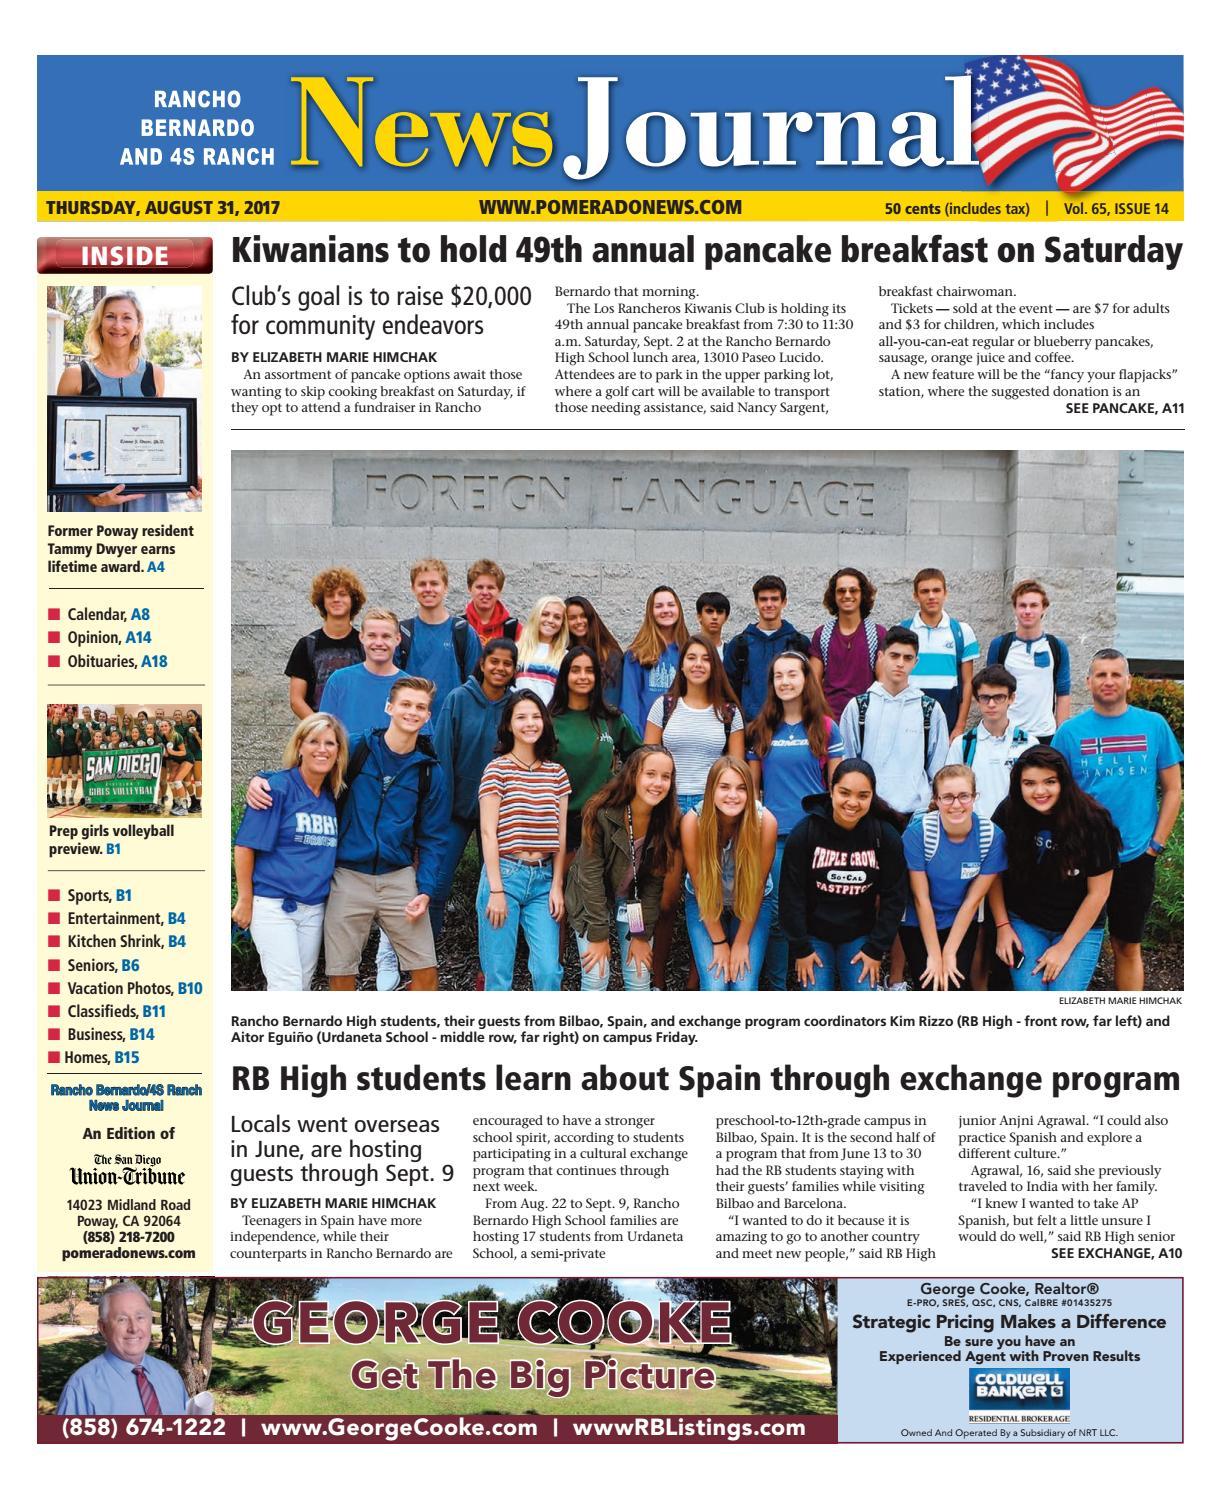 Rancho Bernardo News Journal 08 31 17 by MainStreet Media - issuu